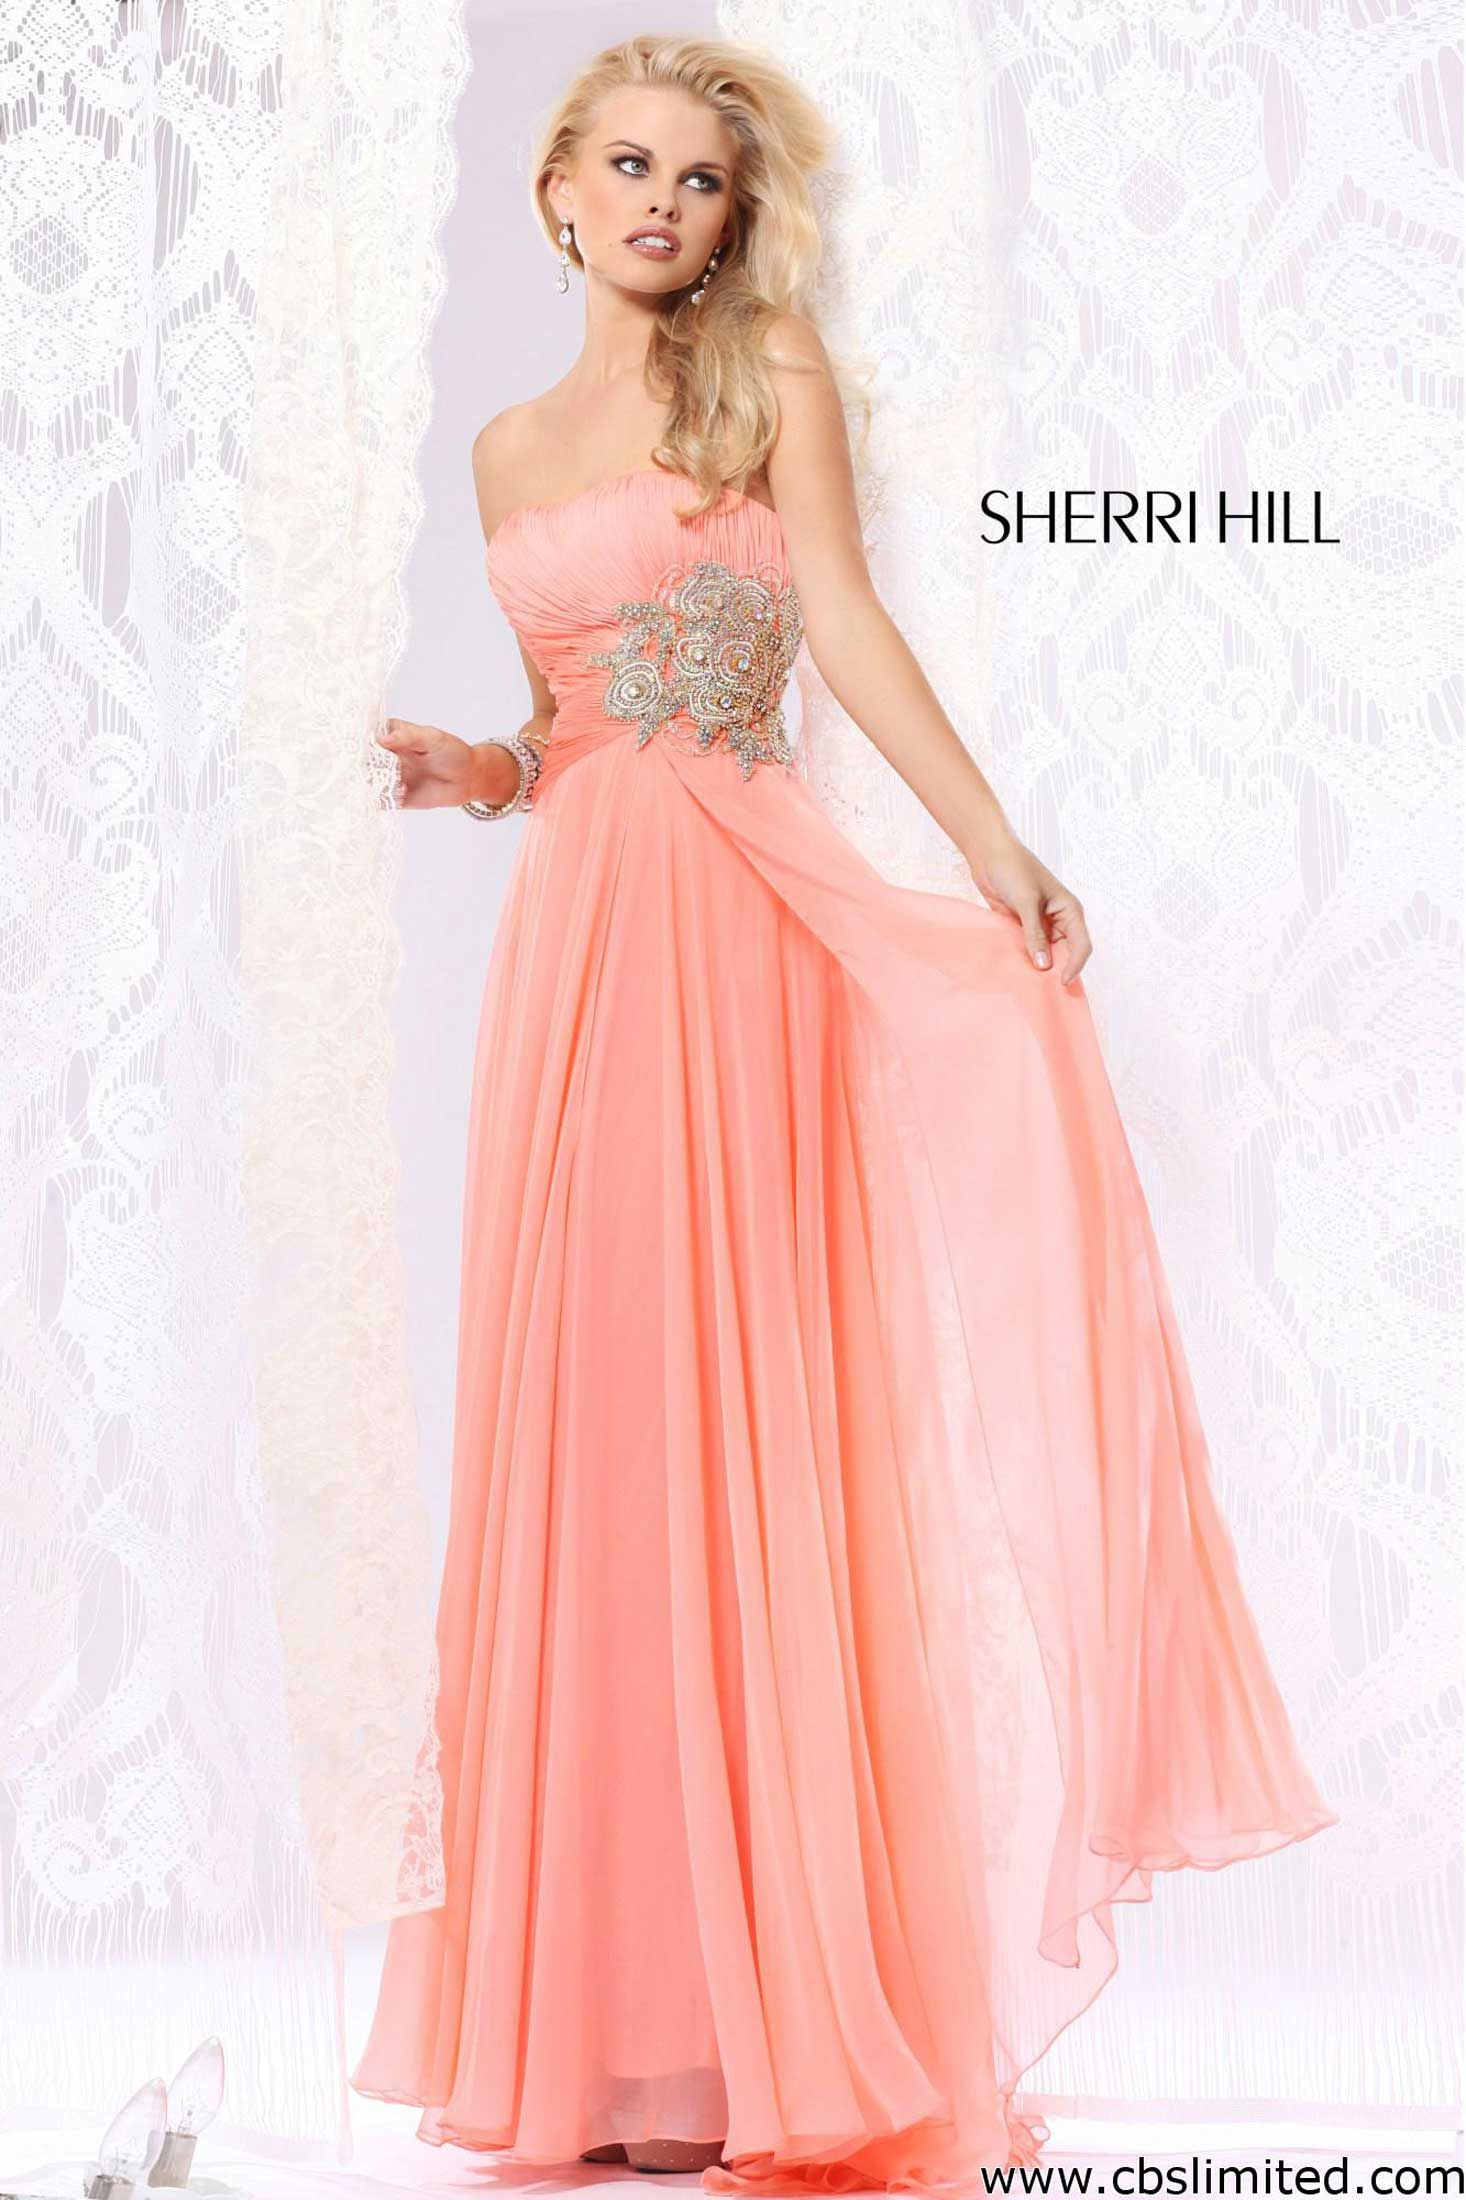 prom dresses 2013 - Sherri Hill | Prom dresses | Pinterest ...